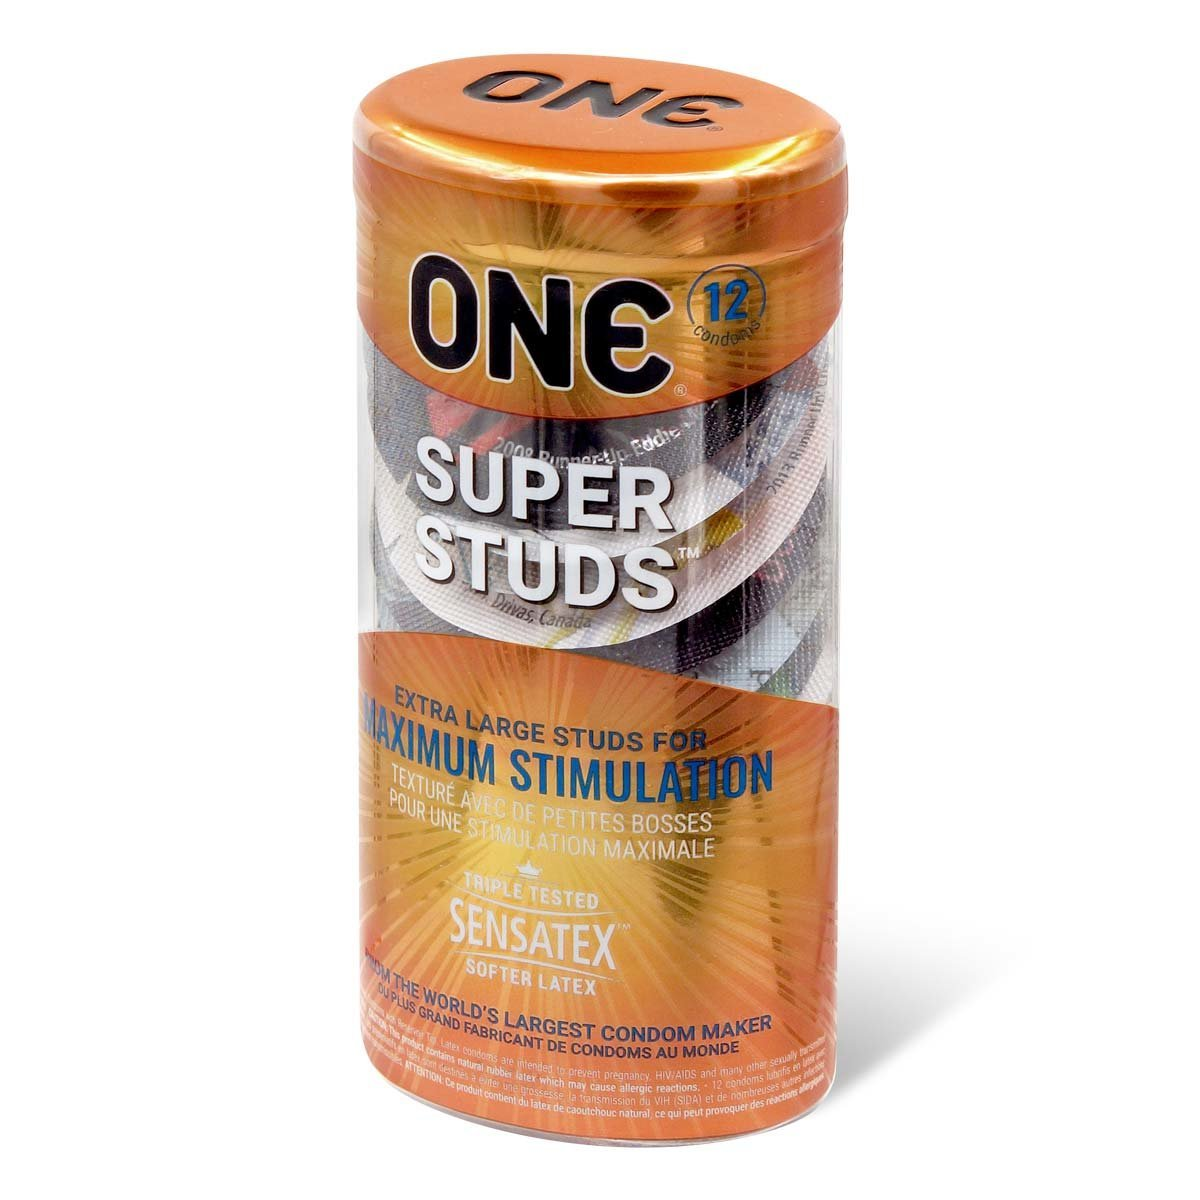 ONE Super Studs 12's Latex Condom